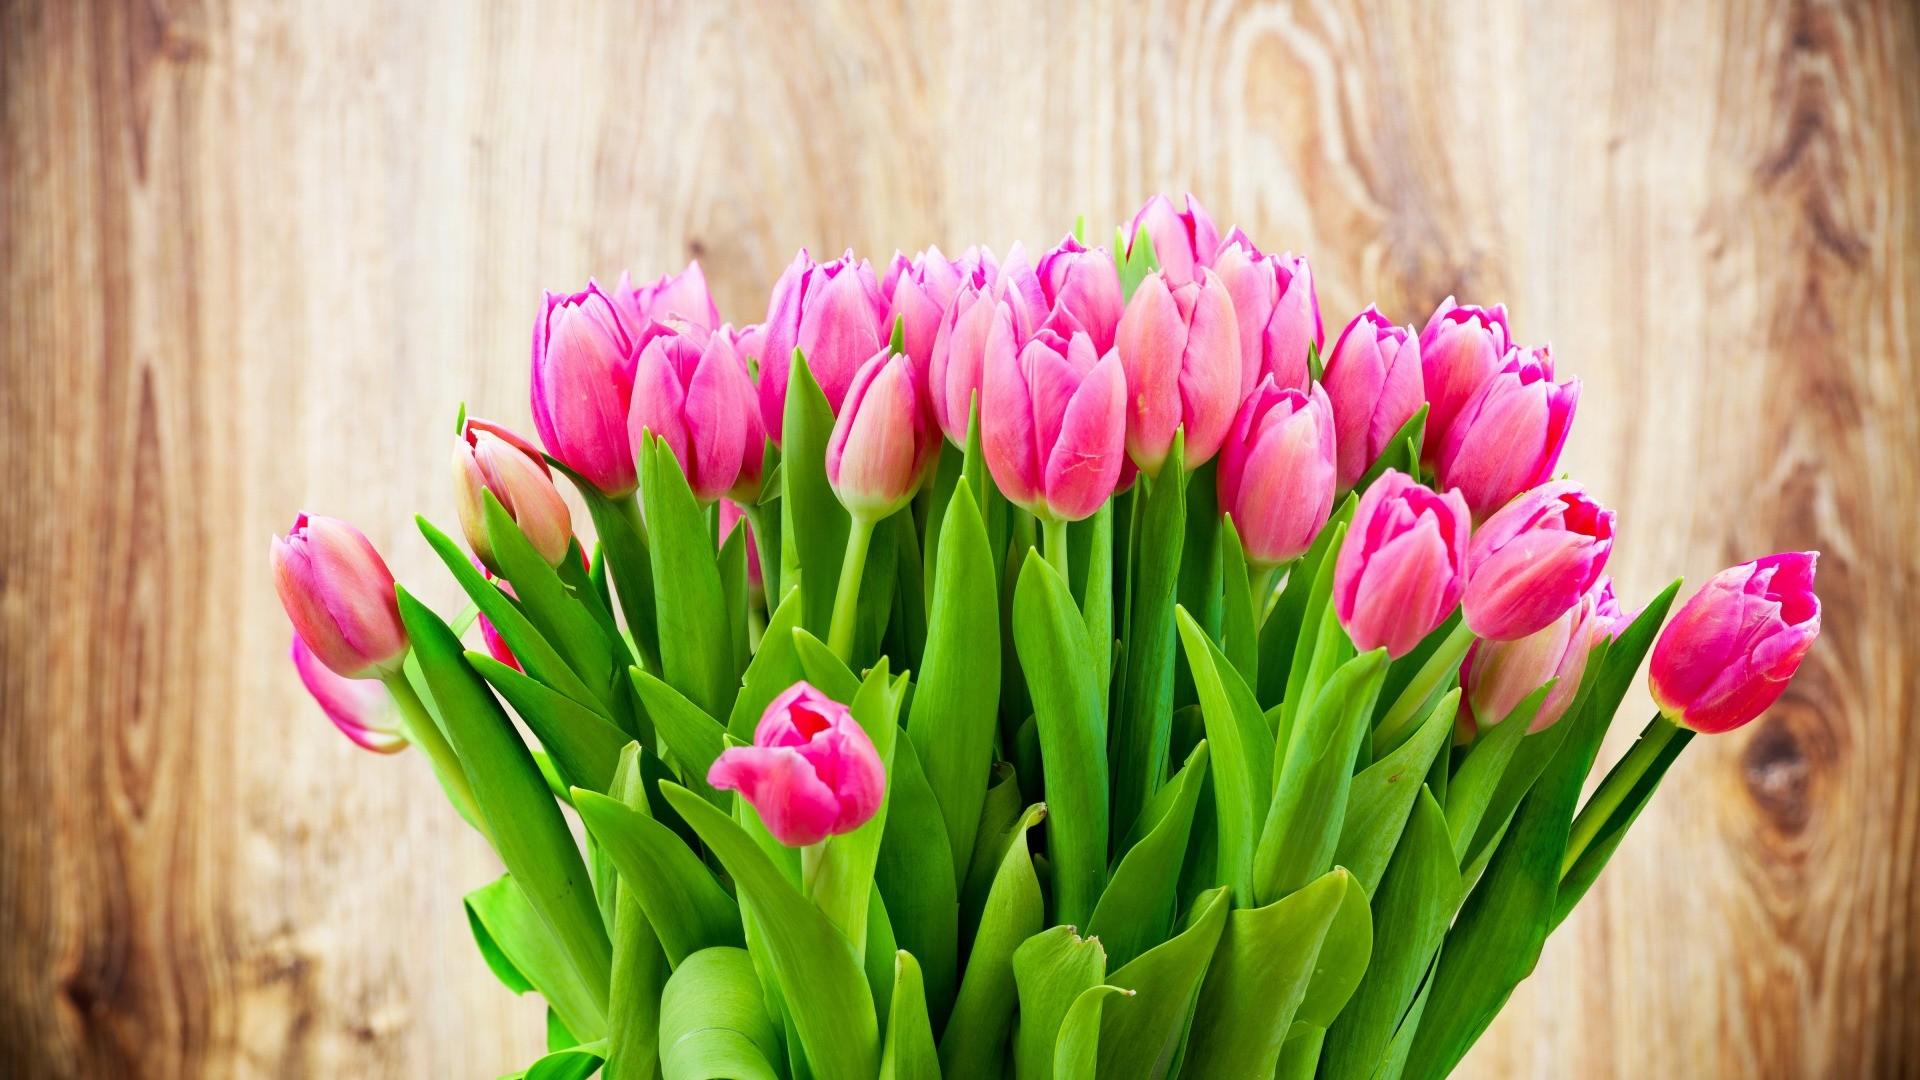 Women's Day Flower desktop image